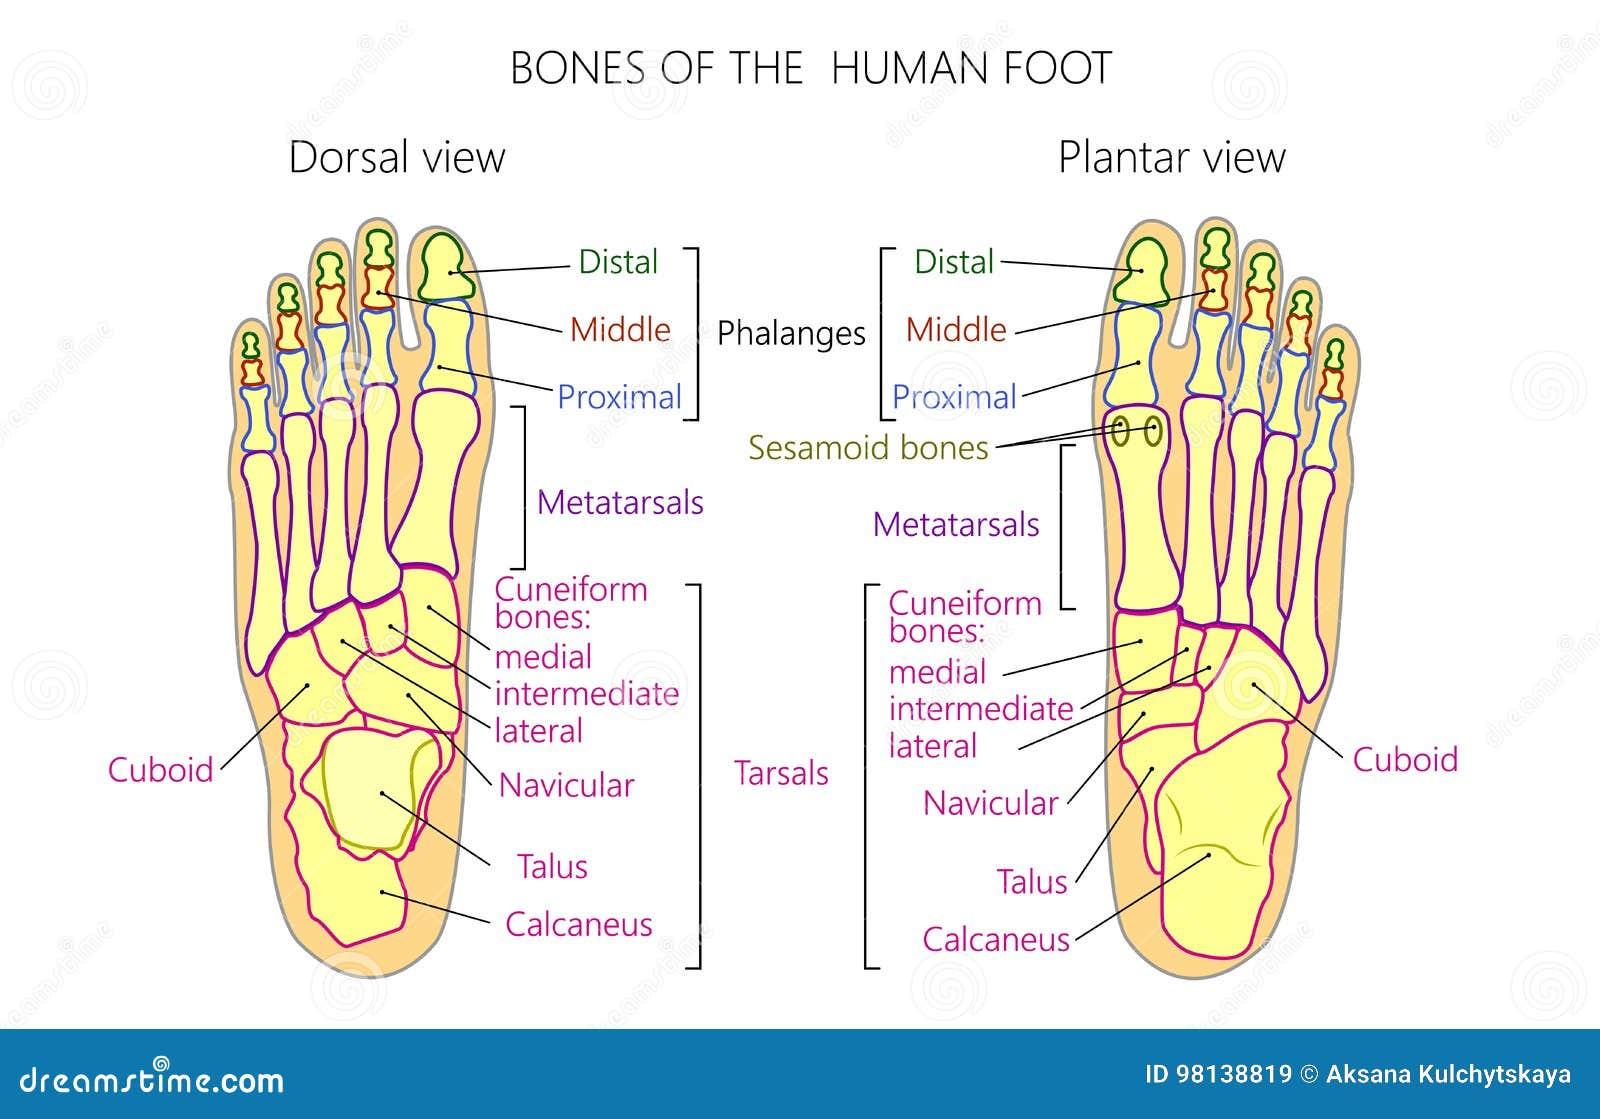 Anatomybones Of The Human Foot Dorsal And Plantar View Stock Vector